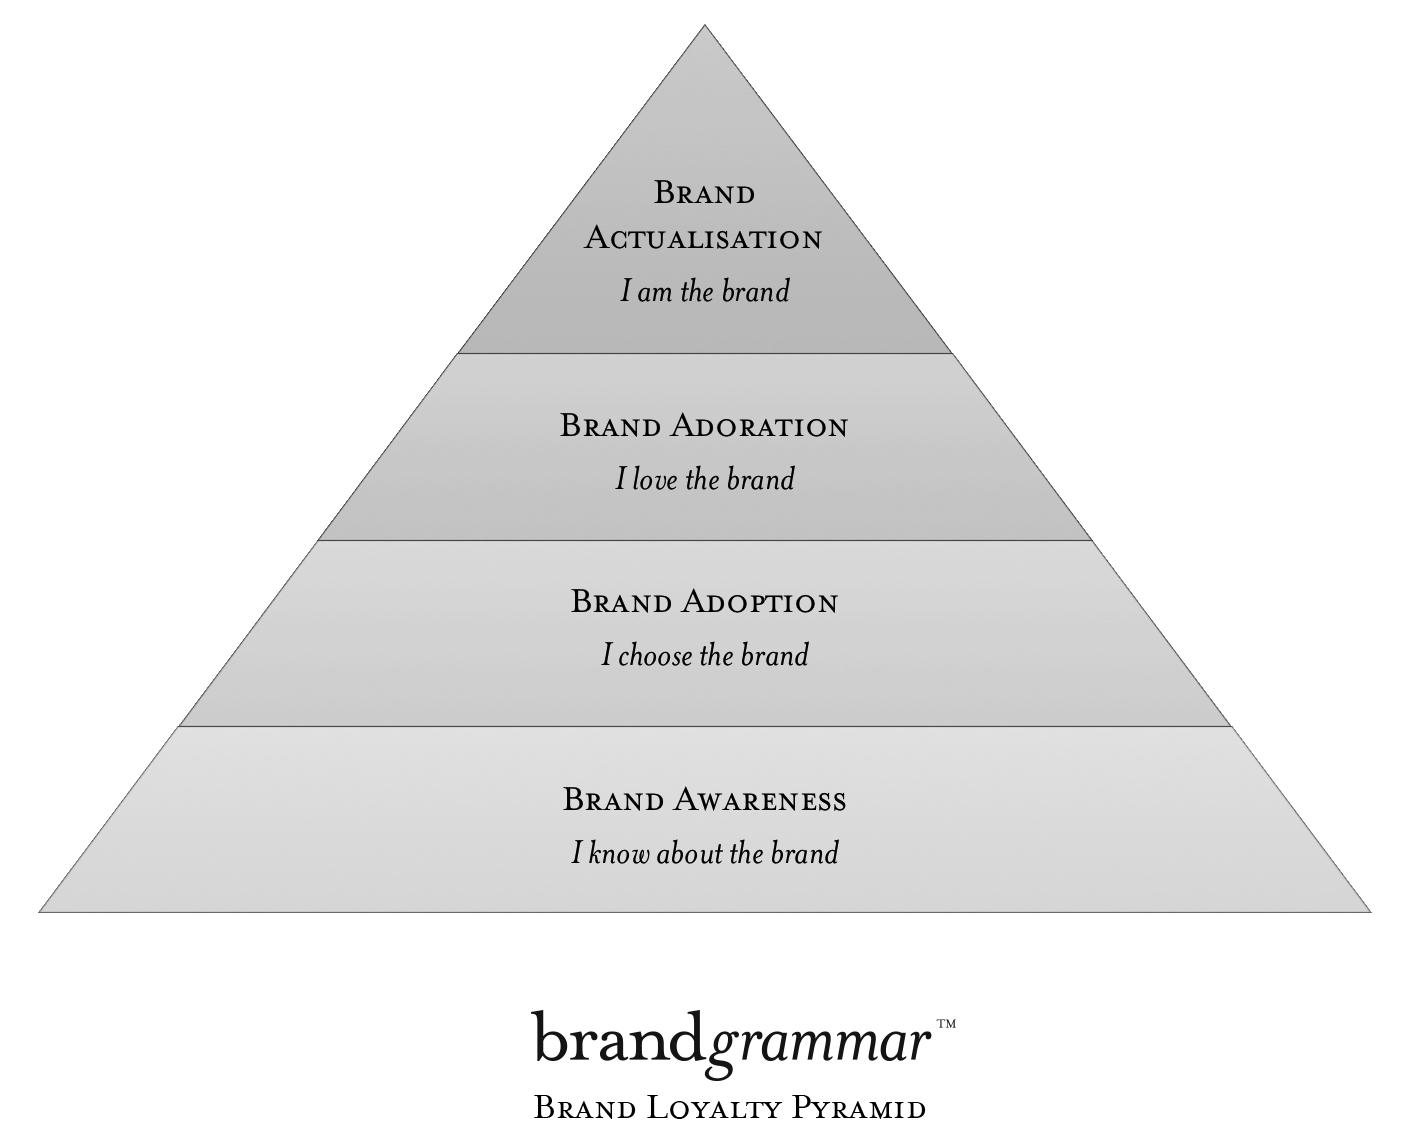 brandgrammar_brand_loyalty_pyramid-2